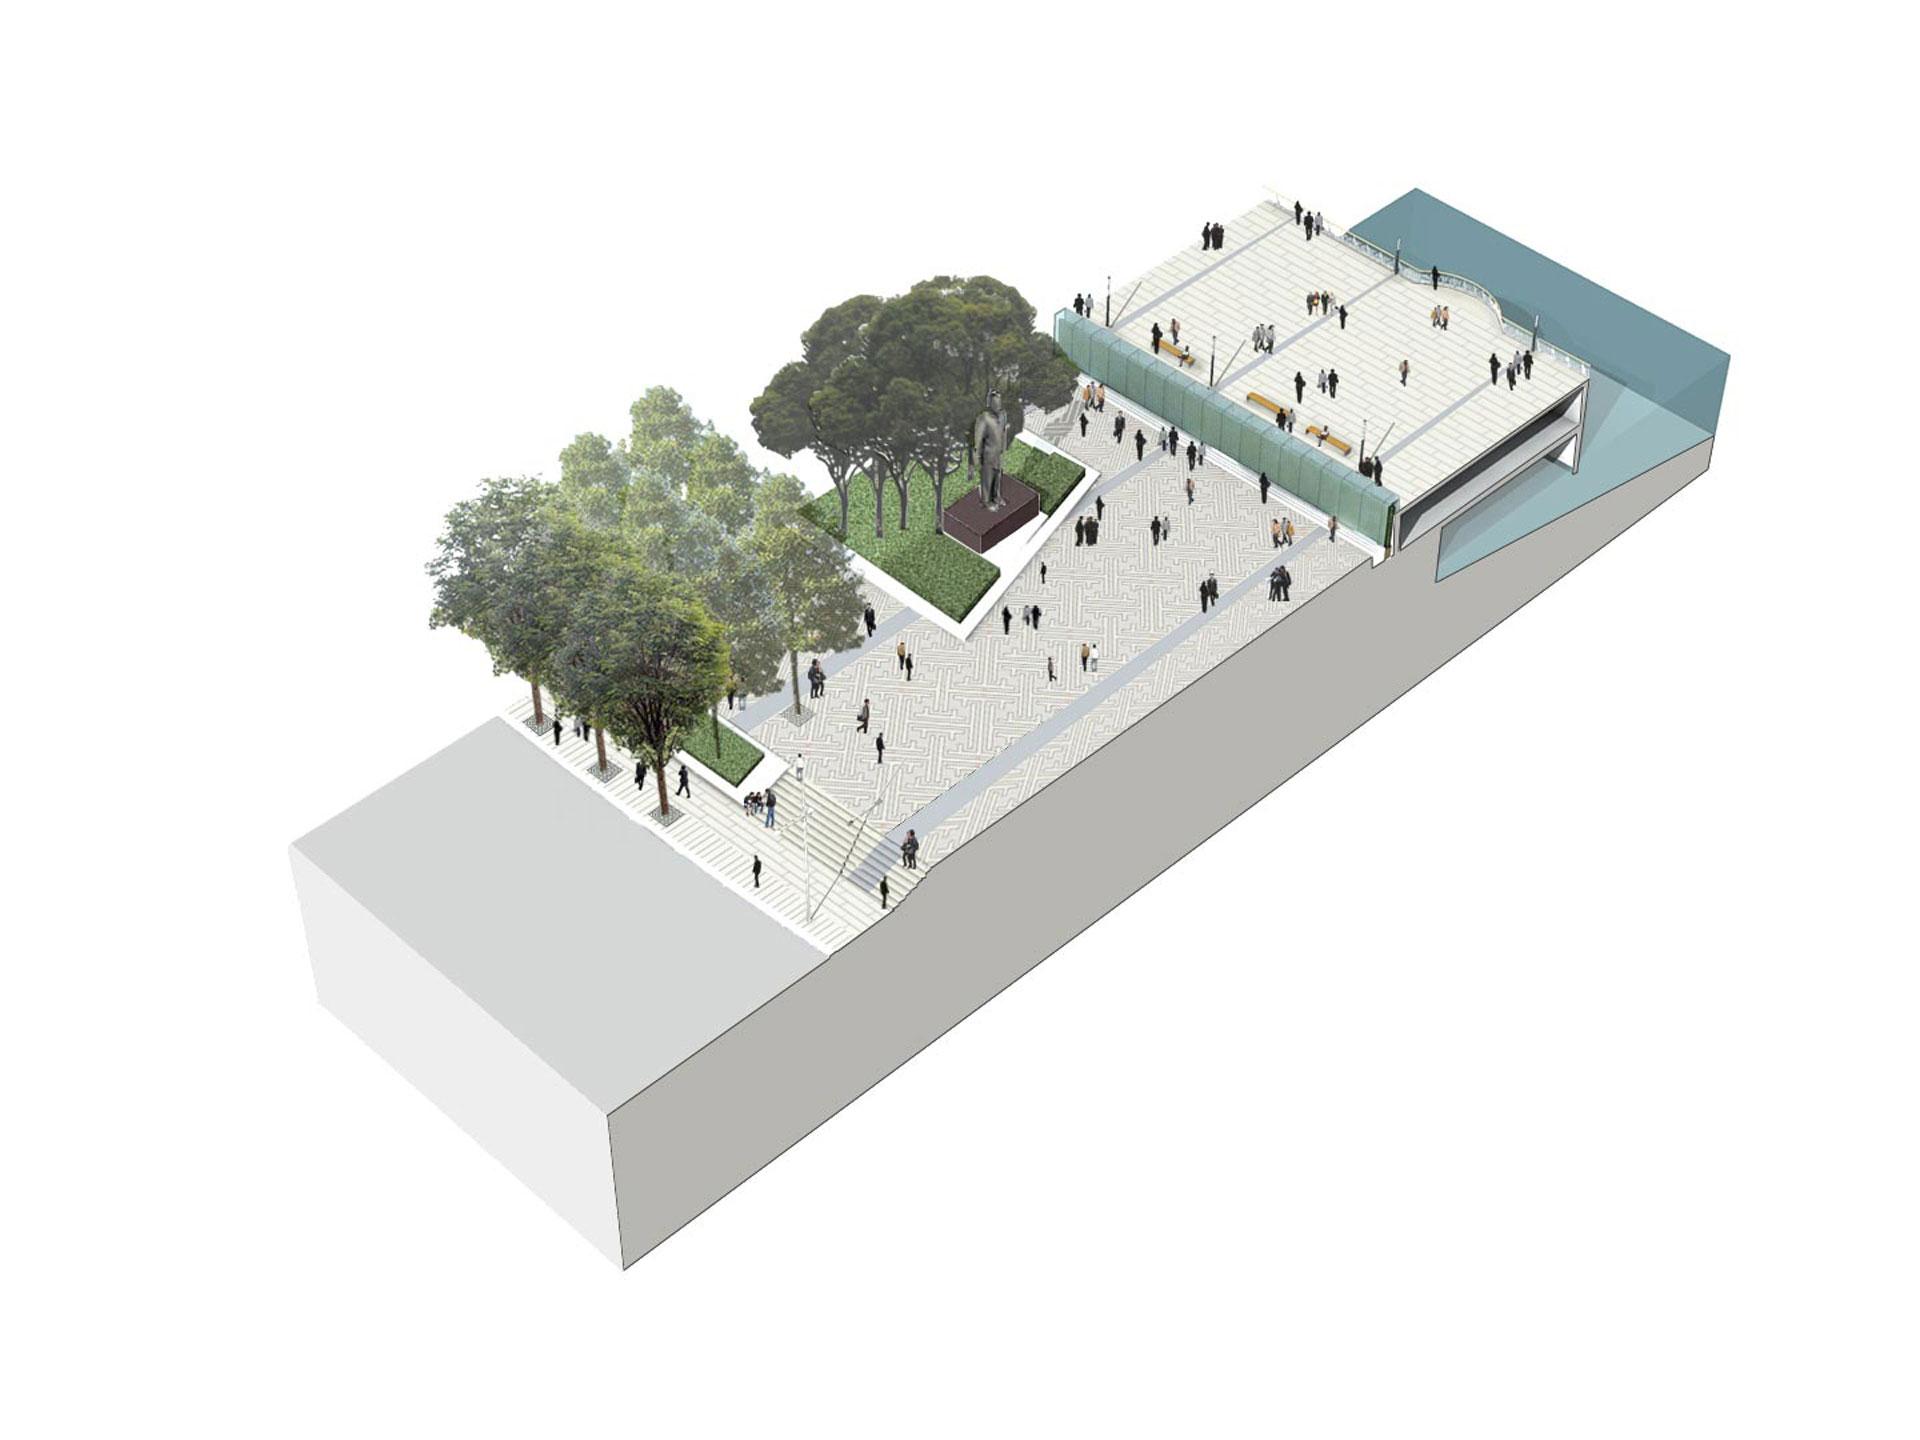 8_Shanghai-Bund_Klopfer-Martin-Design-Group_axonemetric_rendering_riverfront-promenade_paving-detail.jpg